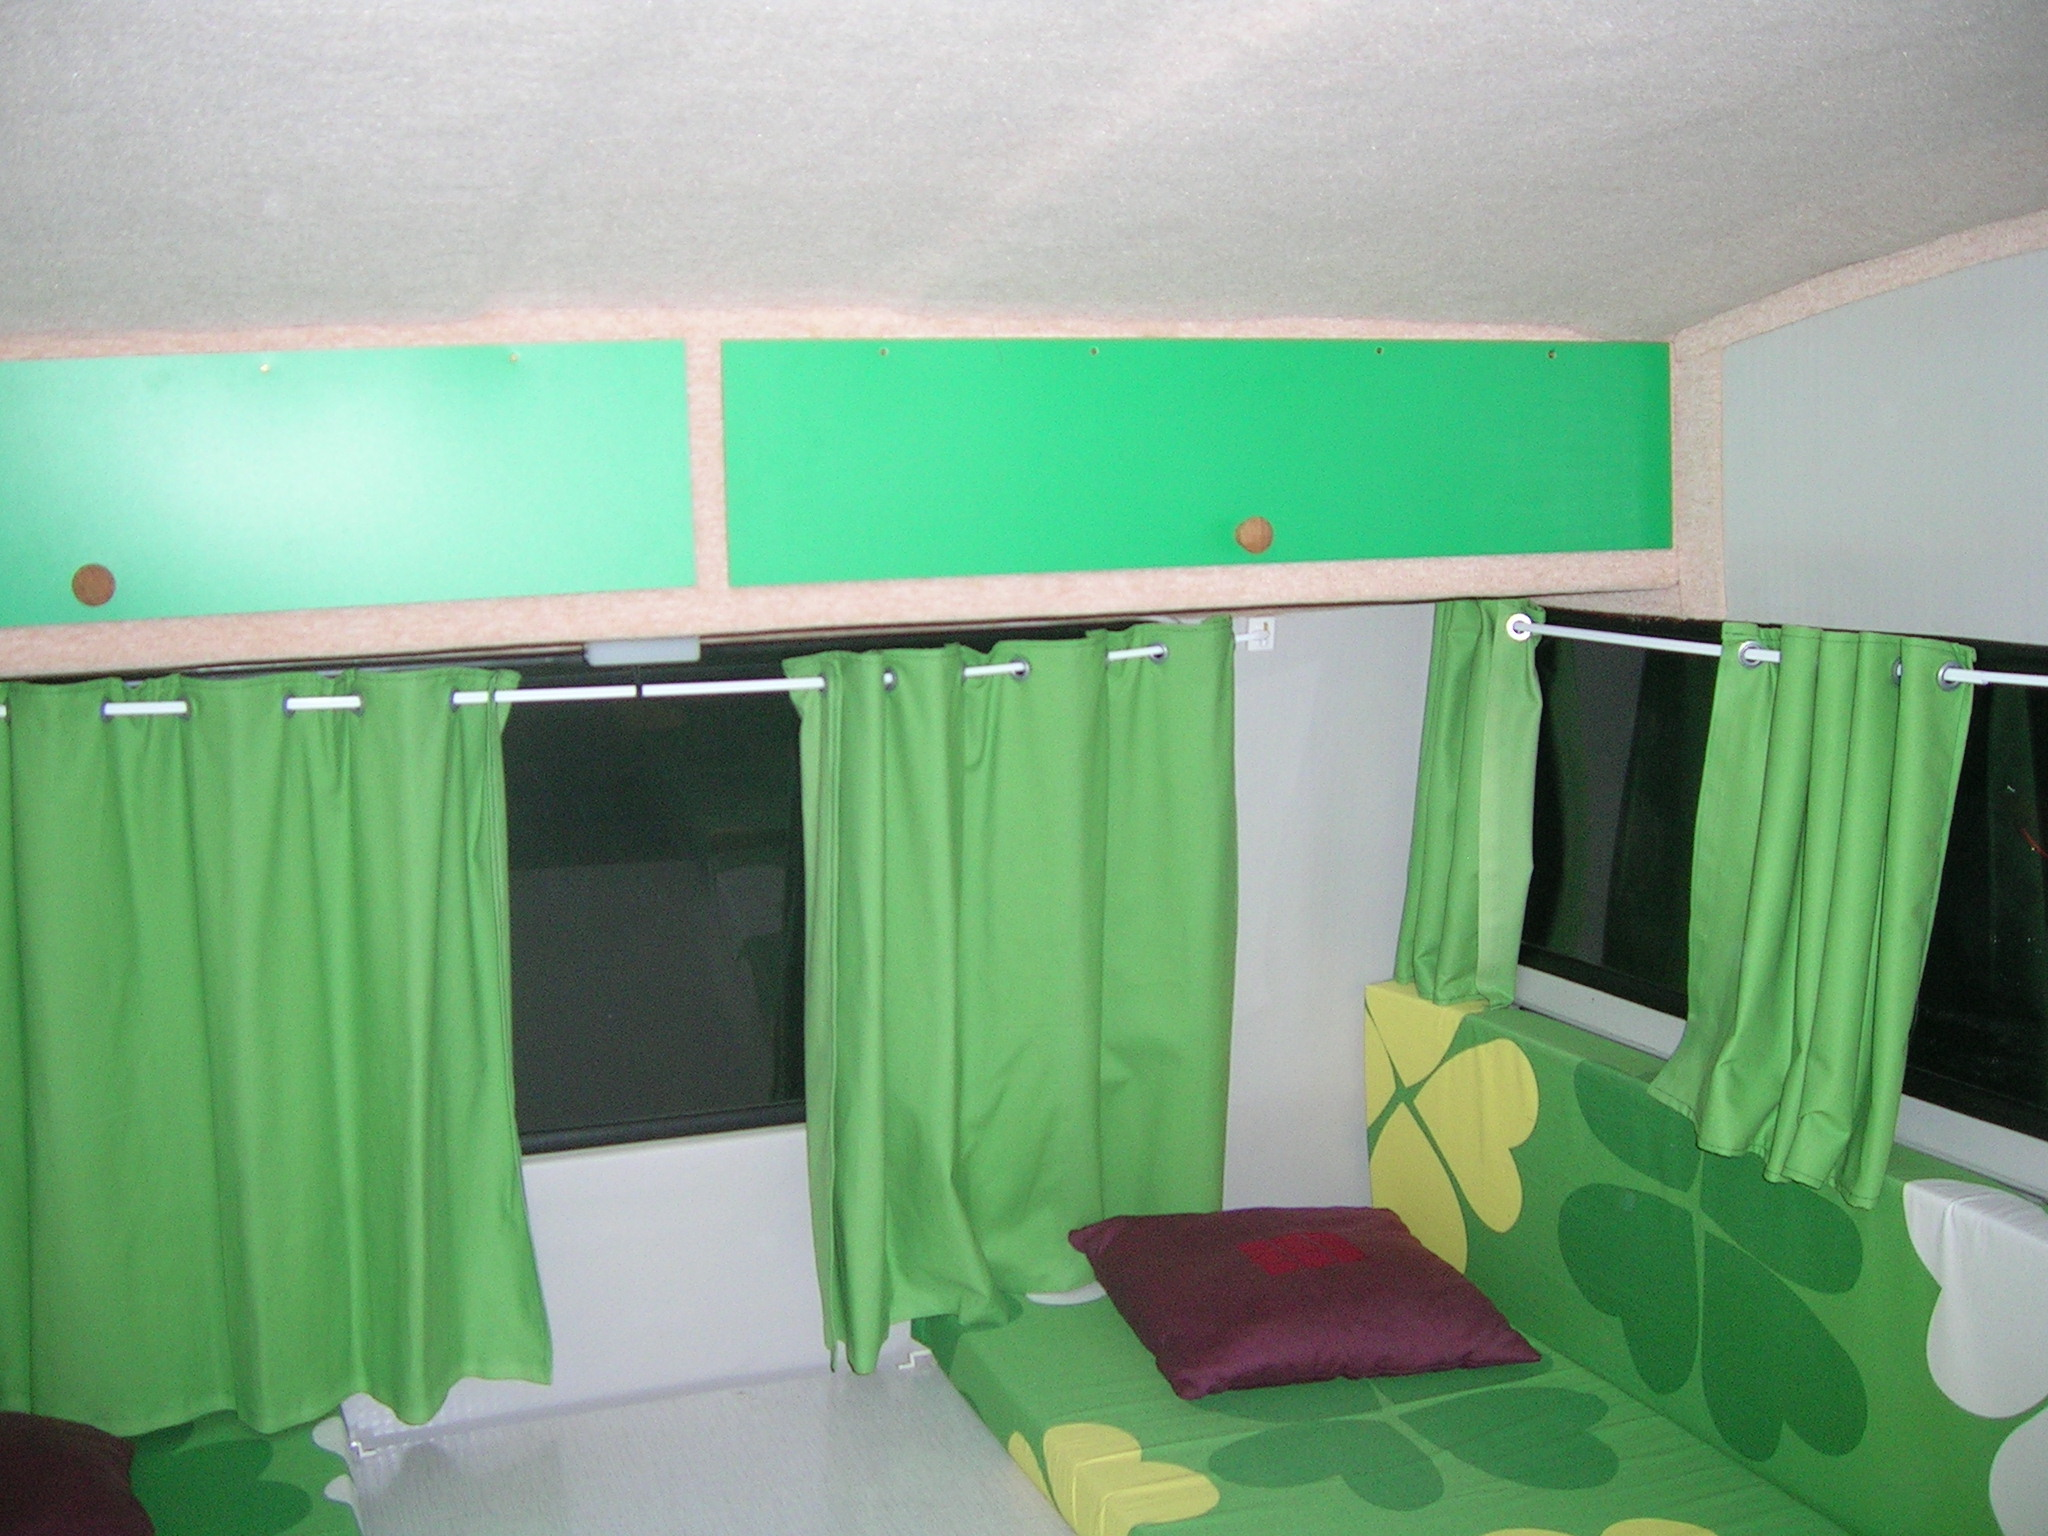 greenies welt innenraum. Black Bedroom Furniture Sets. Home Design Ideas